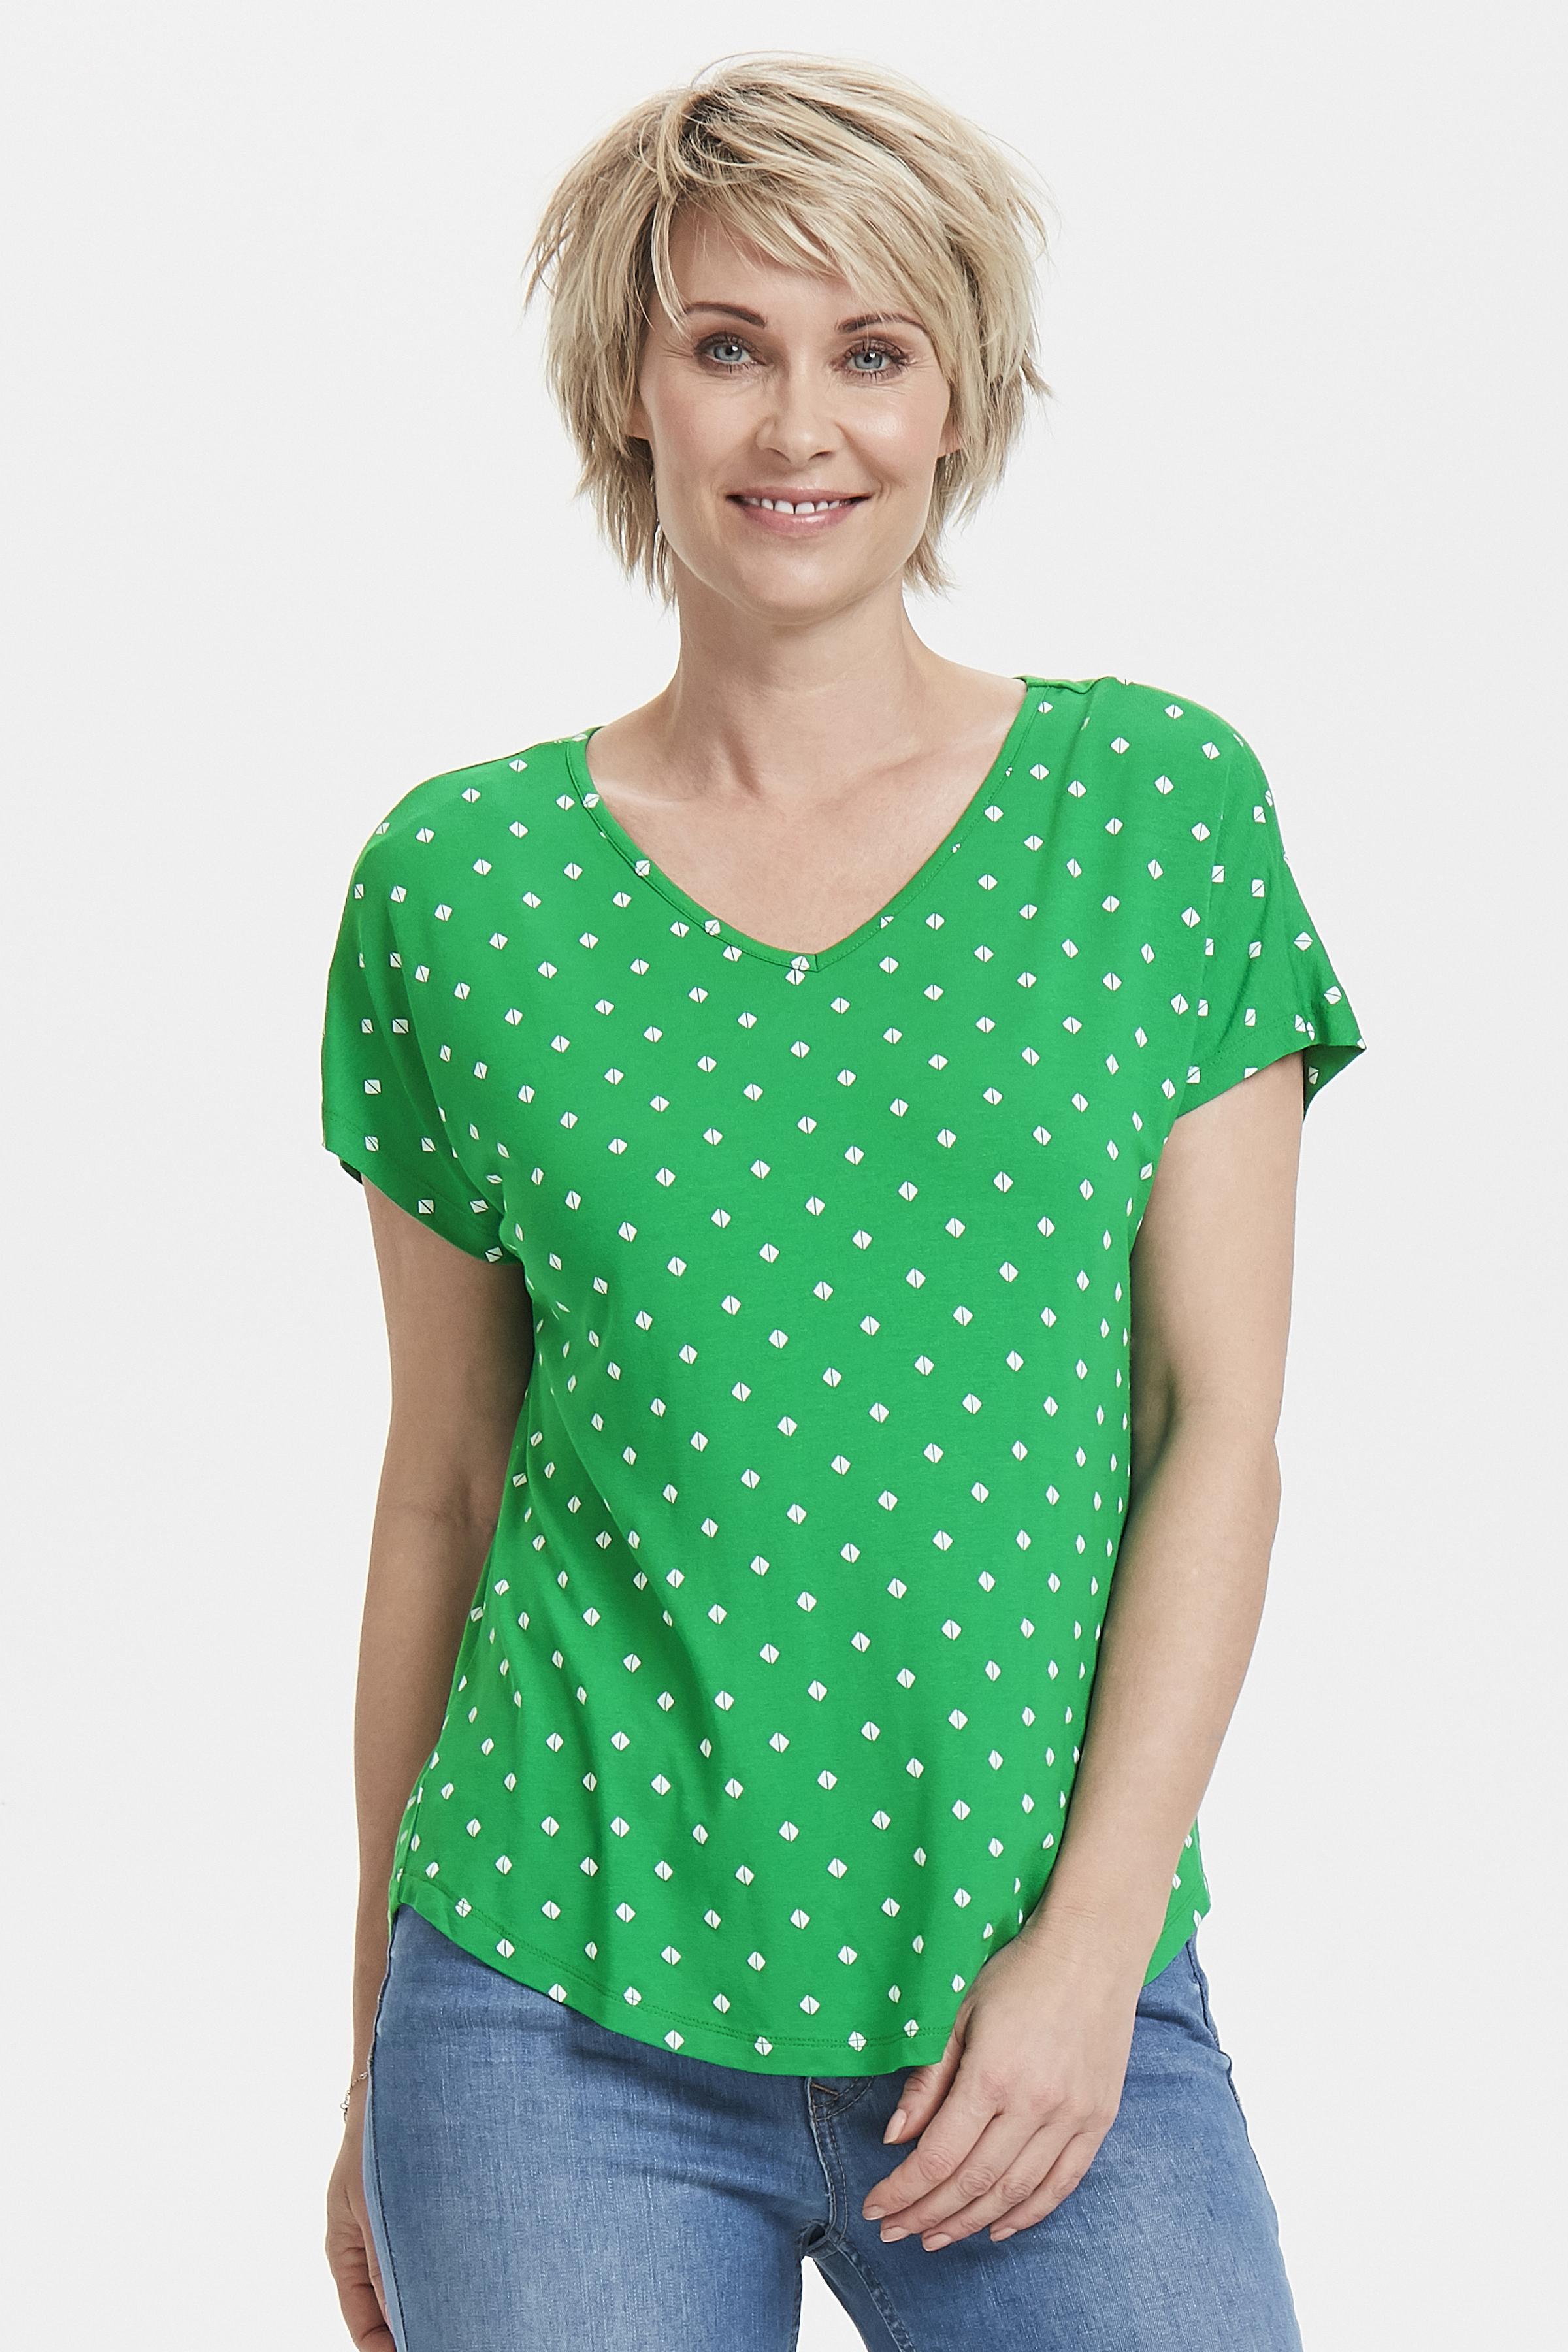 Groen/wit